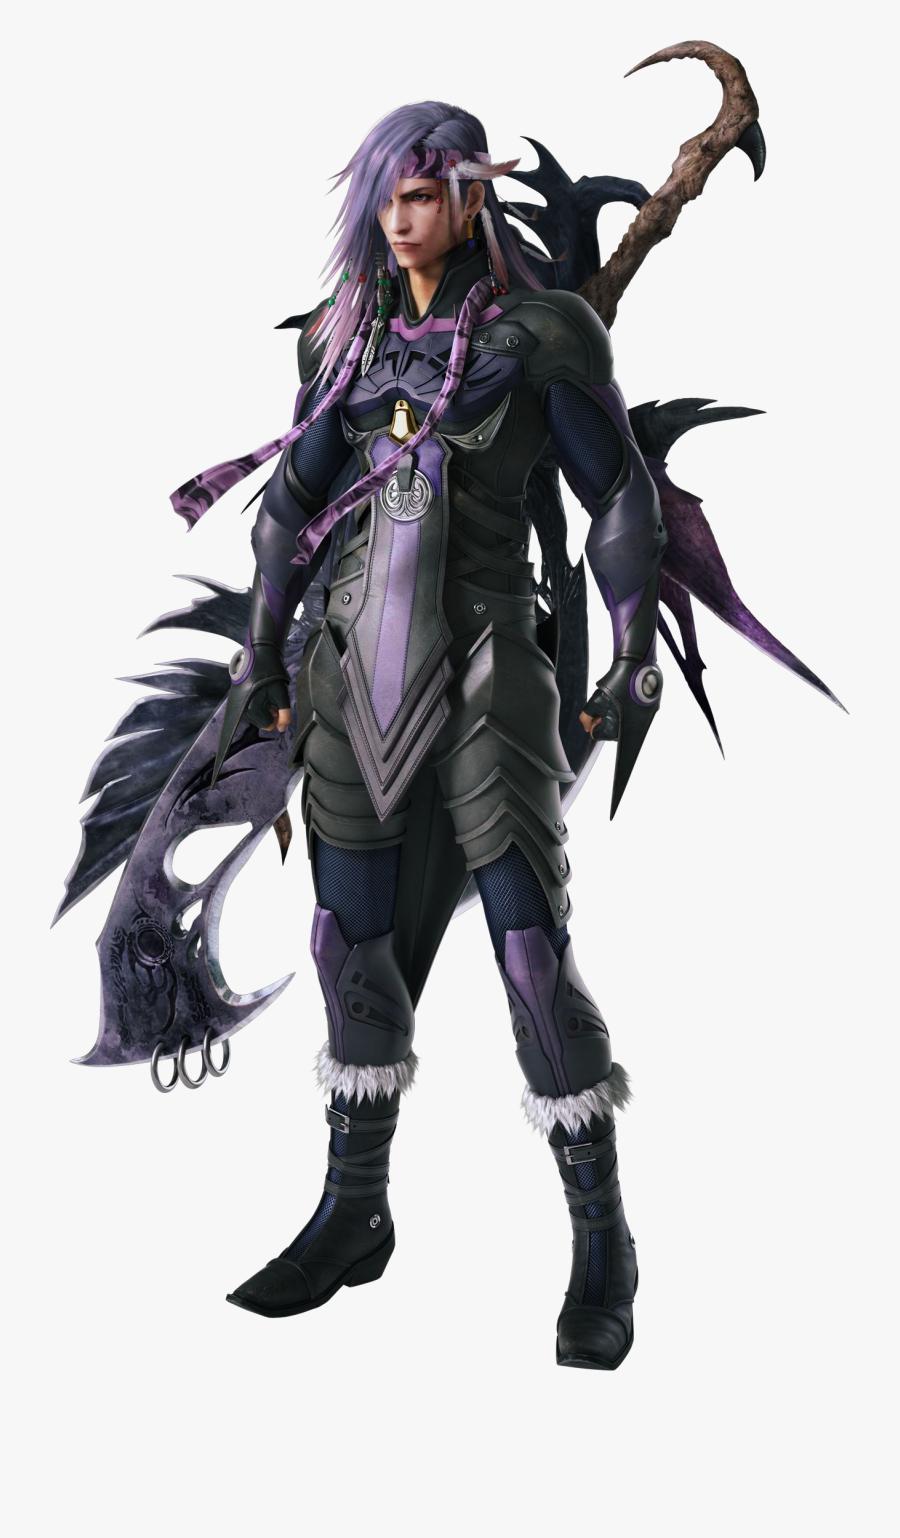 Caius Ballad - Final Fantasy Xiii 2 Caius, Transparent Clipart